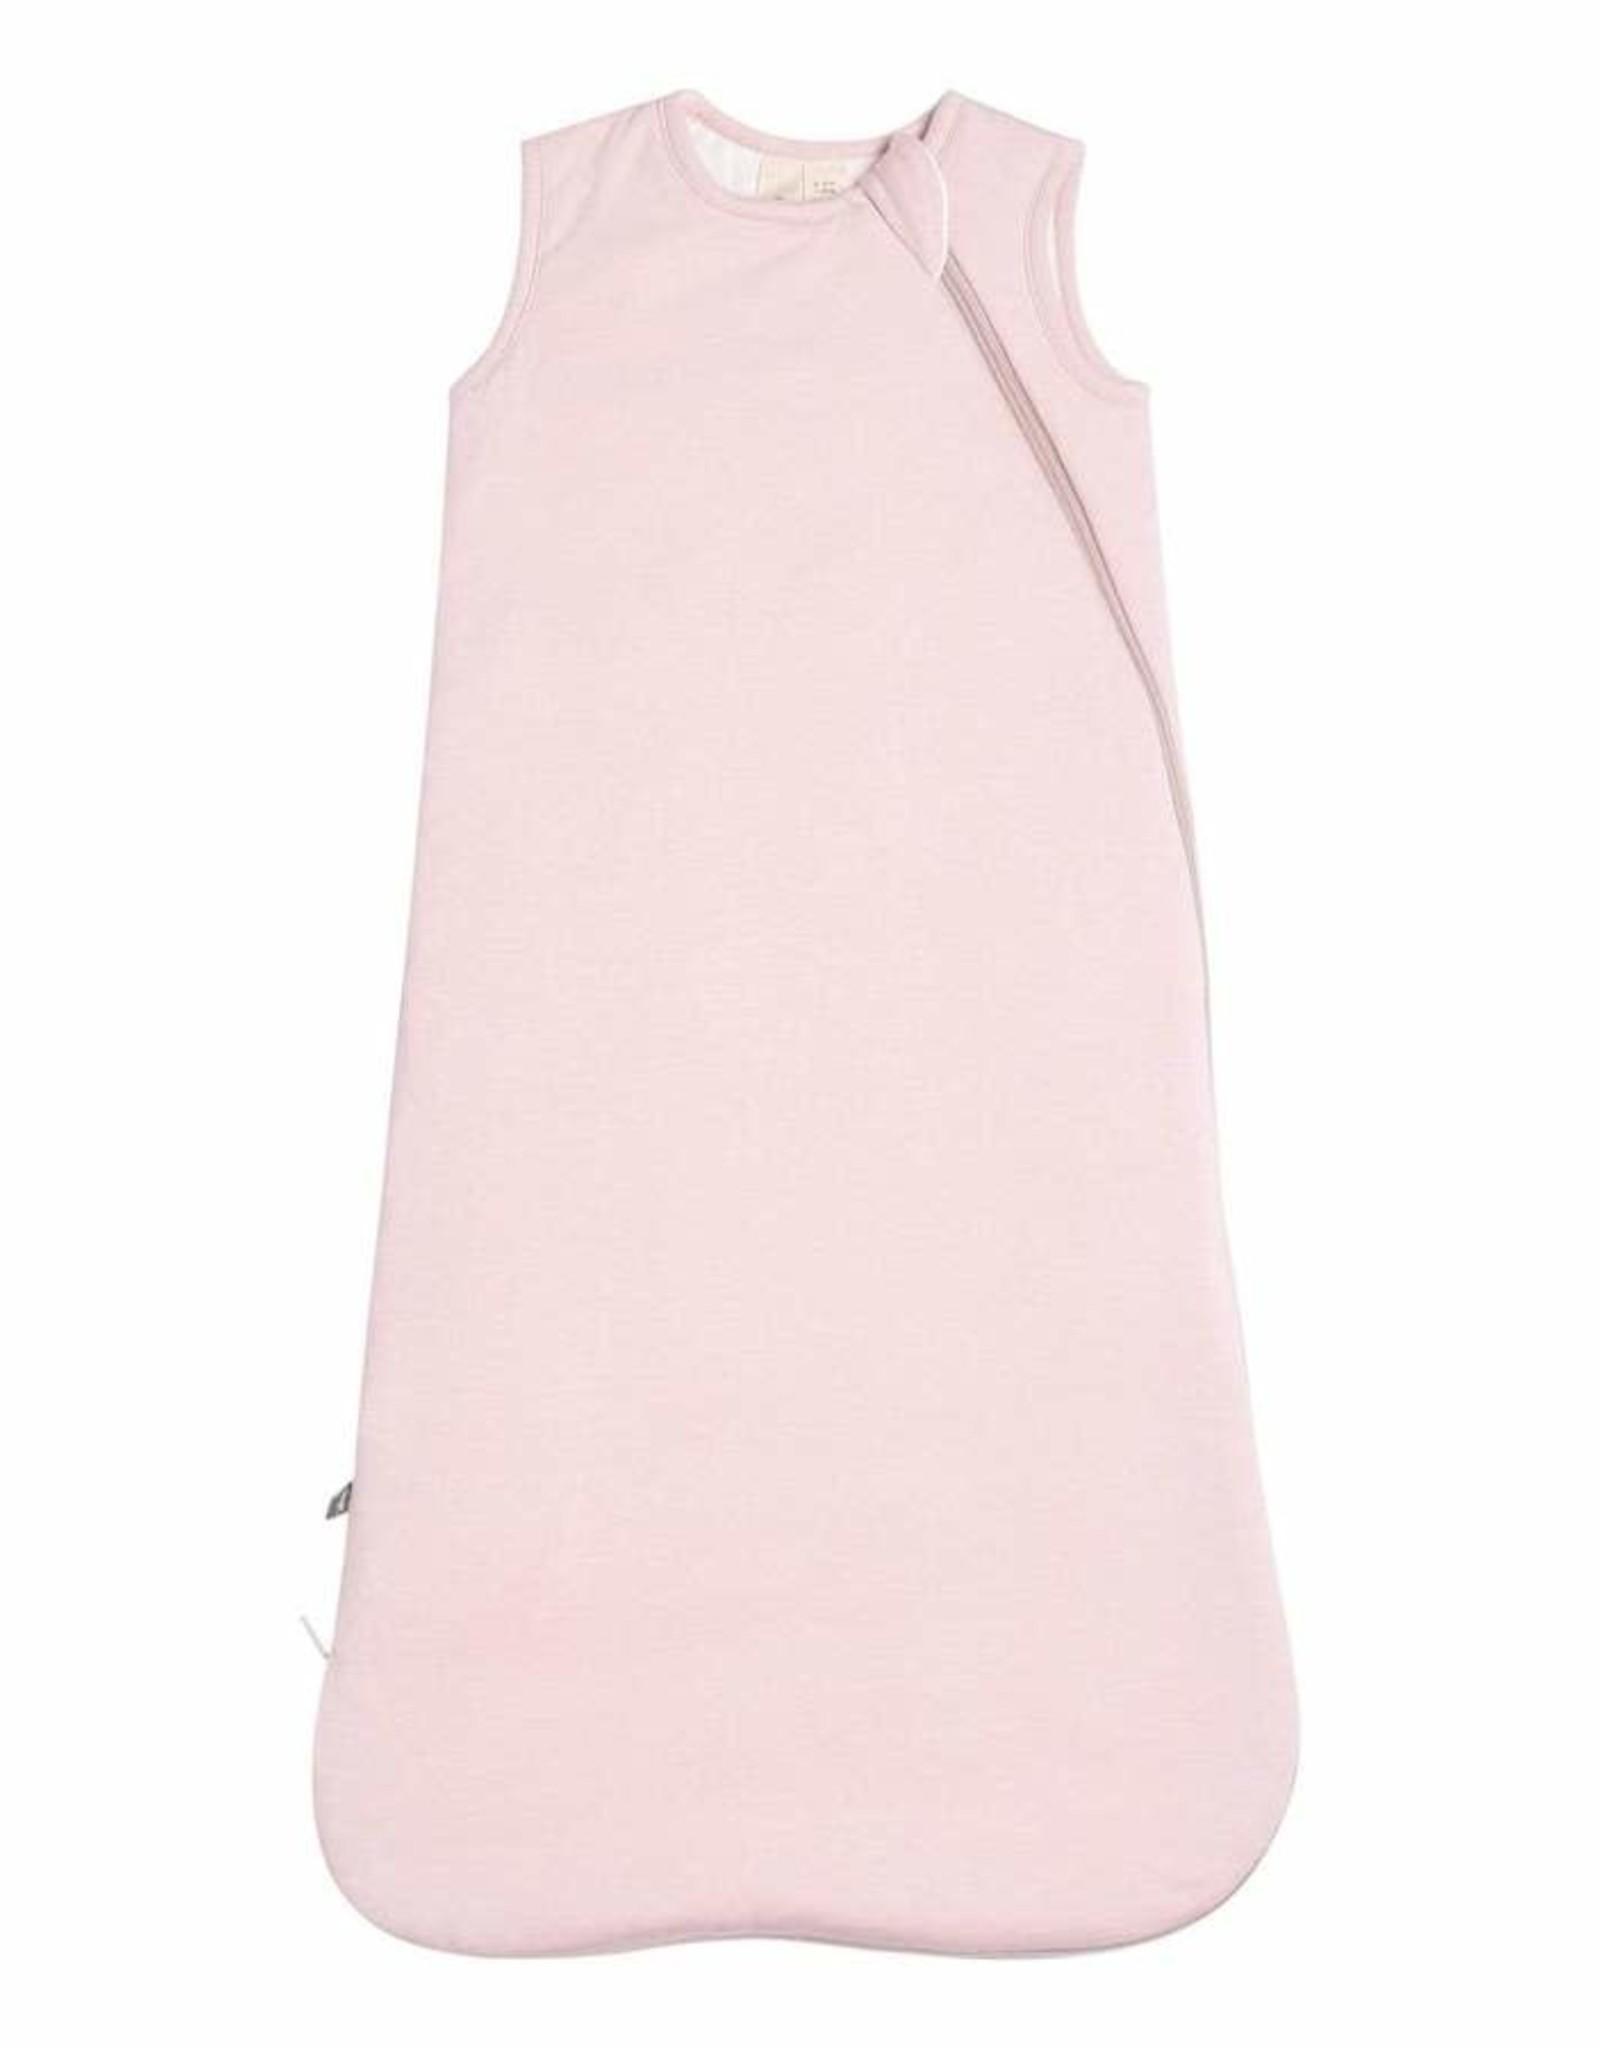 Kyte Baby sleep bag 1.0 (6-18m)- blush